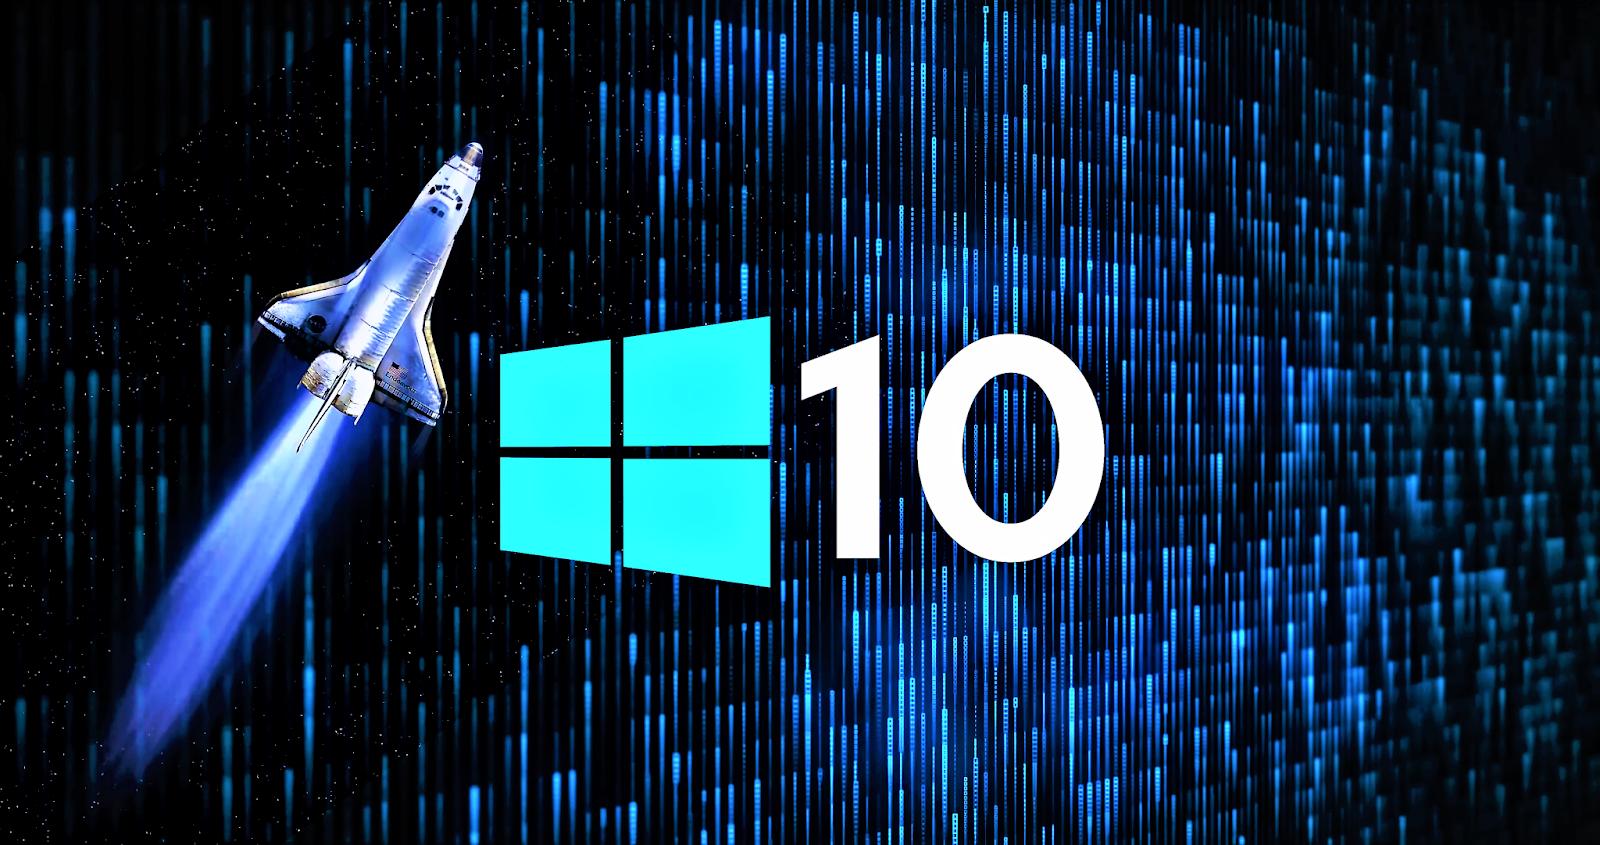 Windows 10 help.